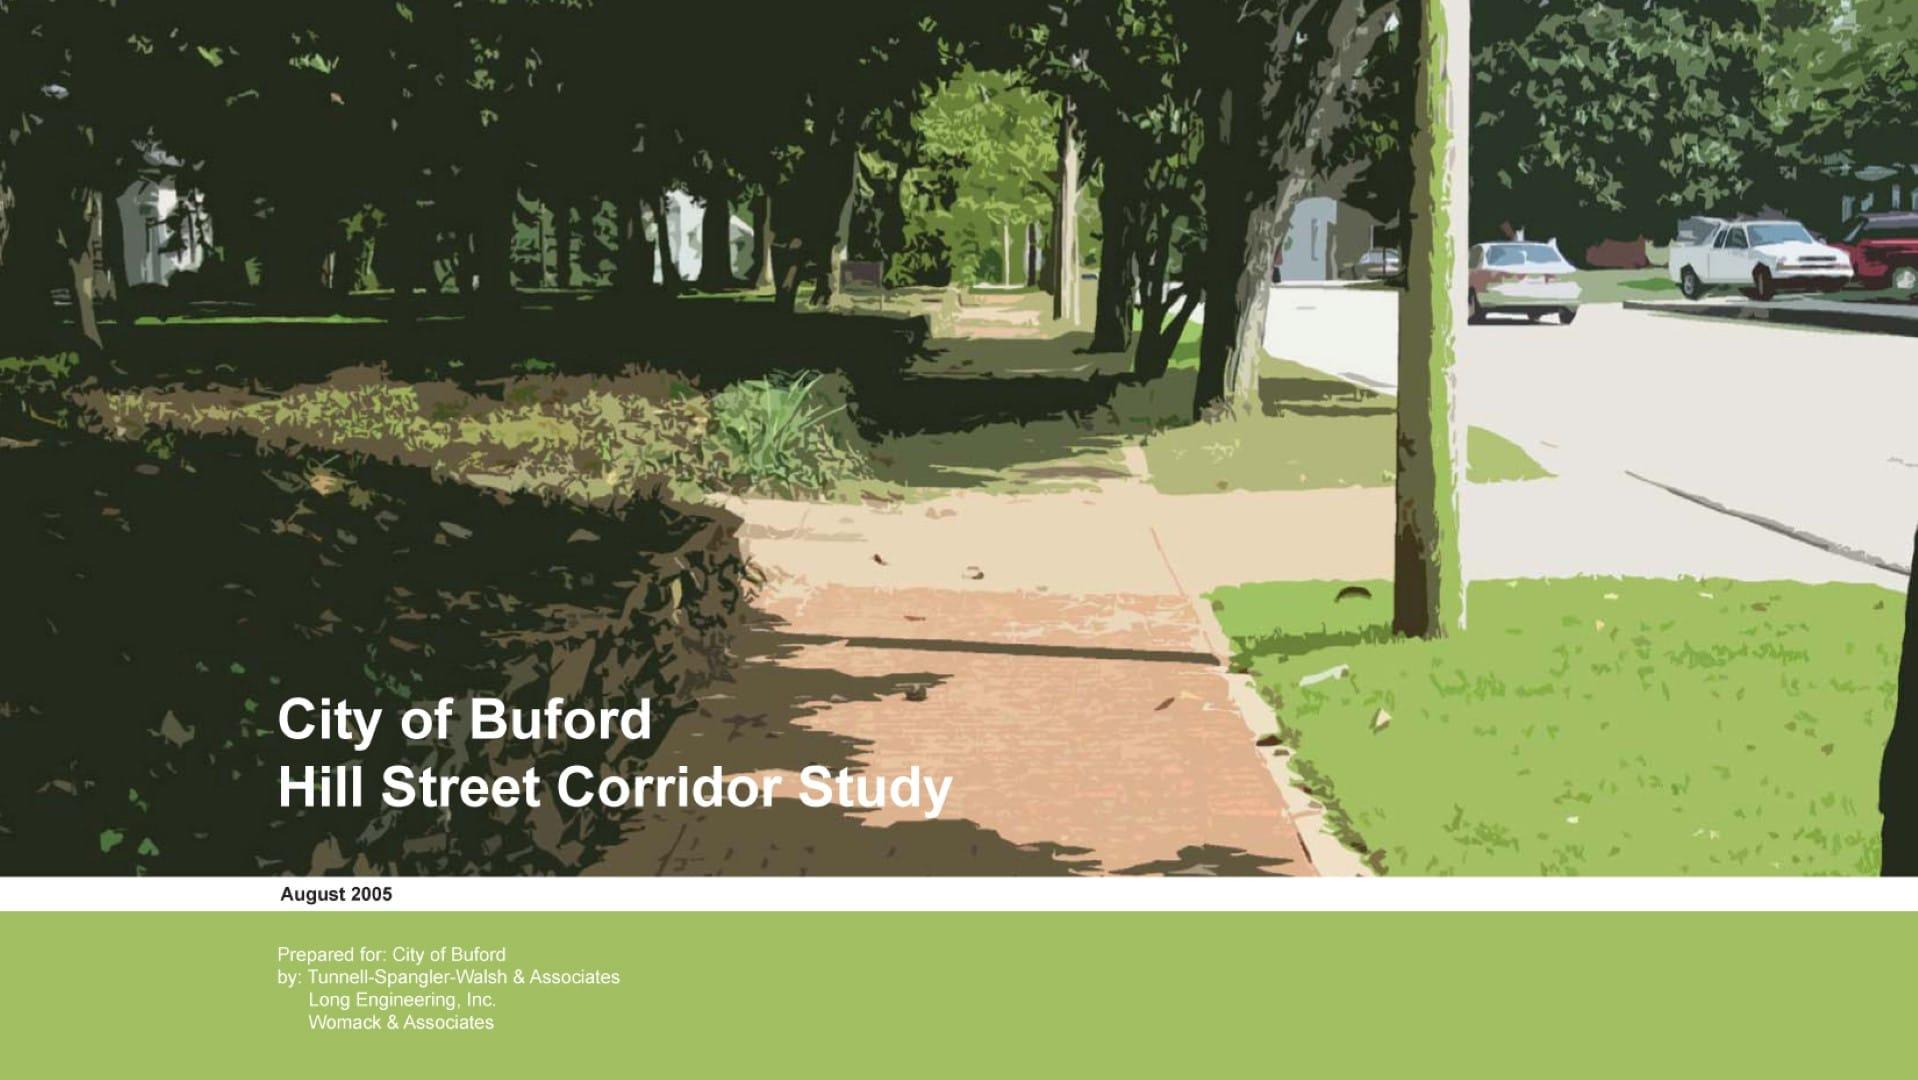 Hill Street Corridor Study